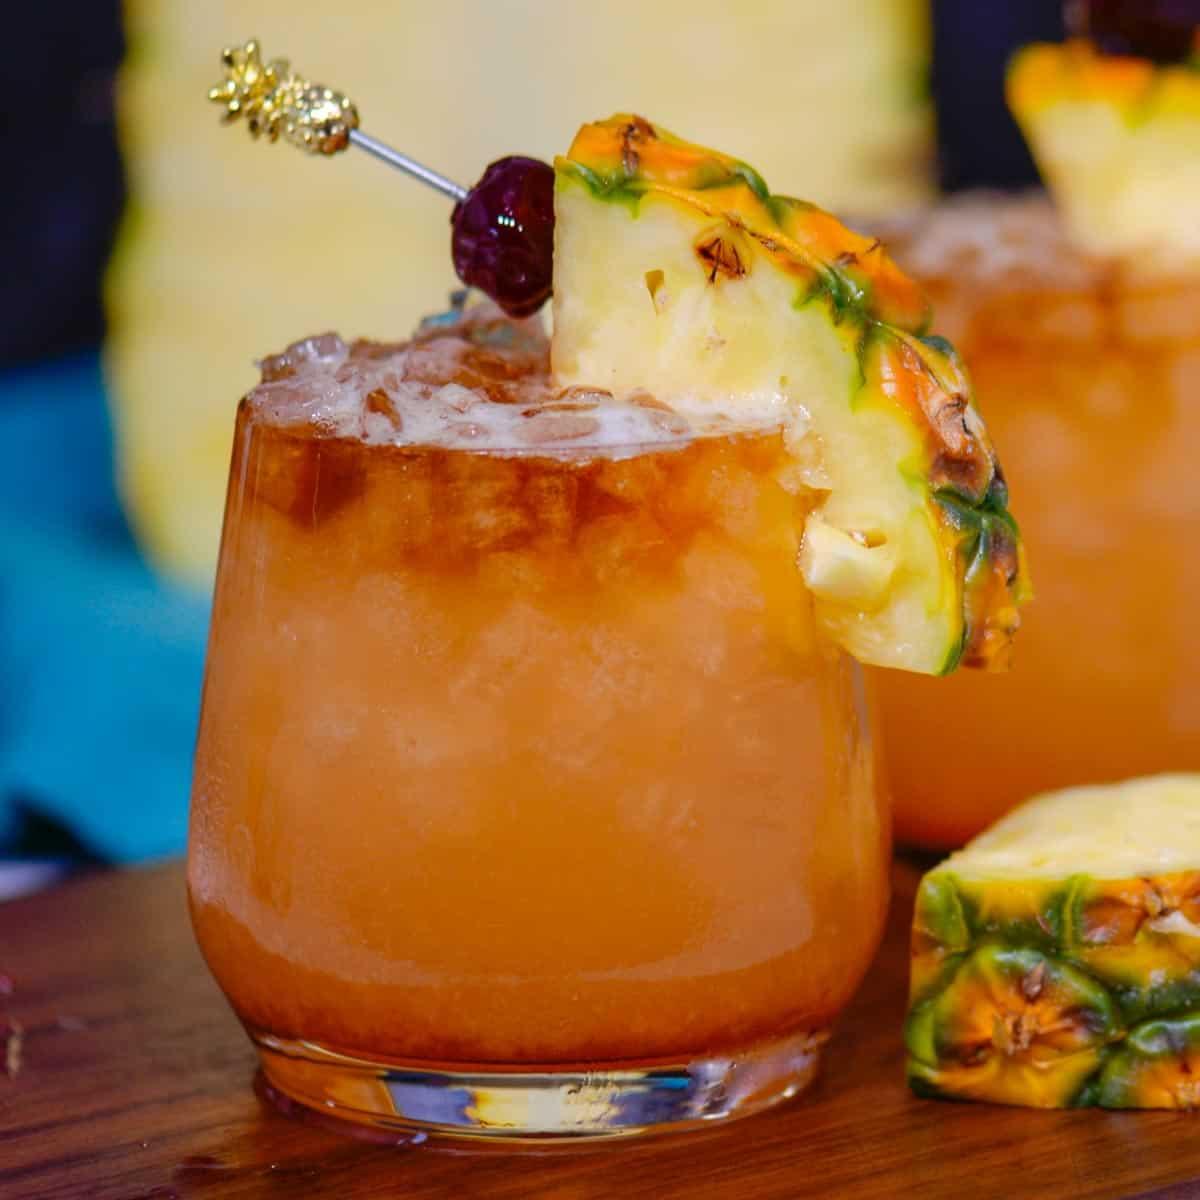 Hawaiian mait tai cocktail garnished with a pineapple wedge and a maraschino cherry